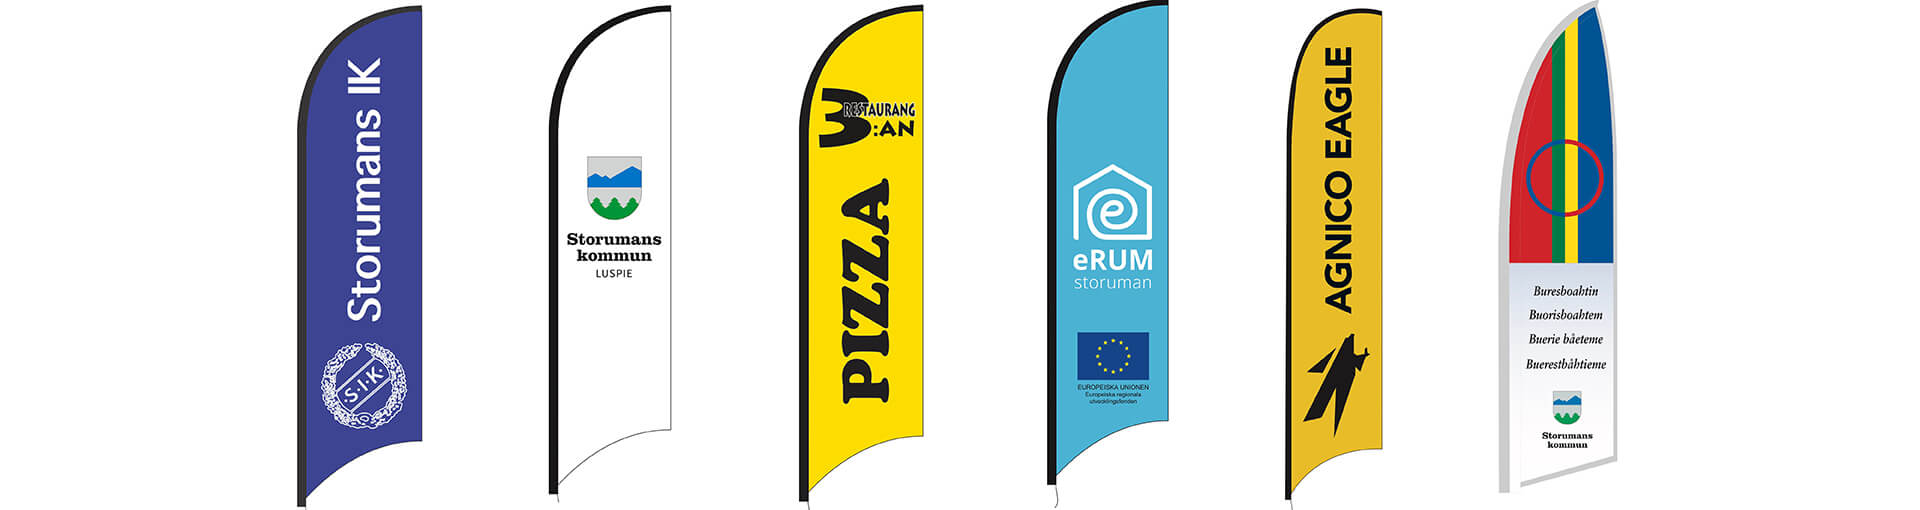 beachflags i tre olika storlekar